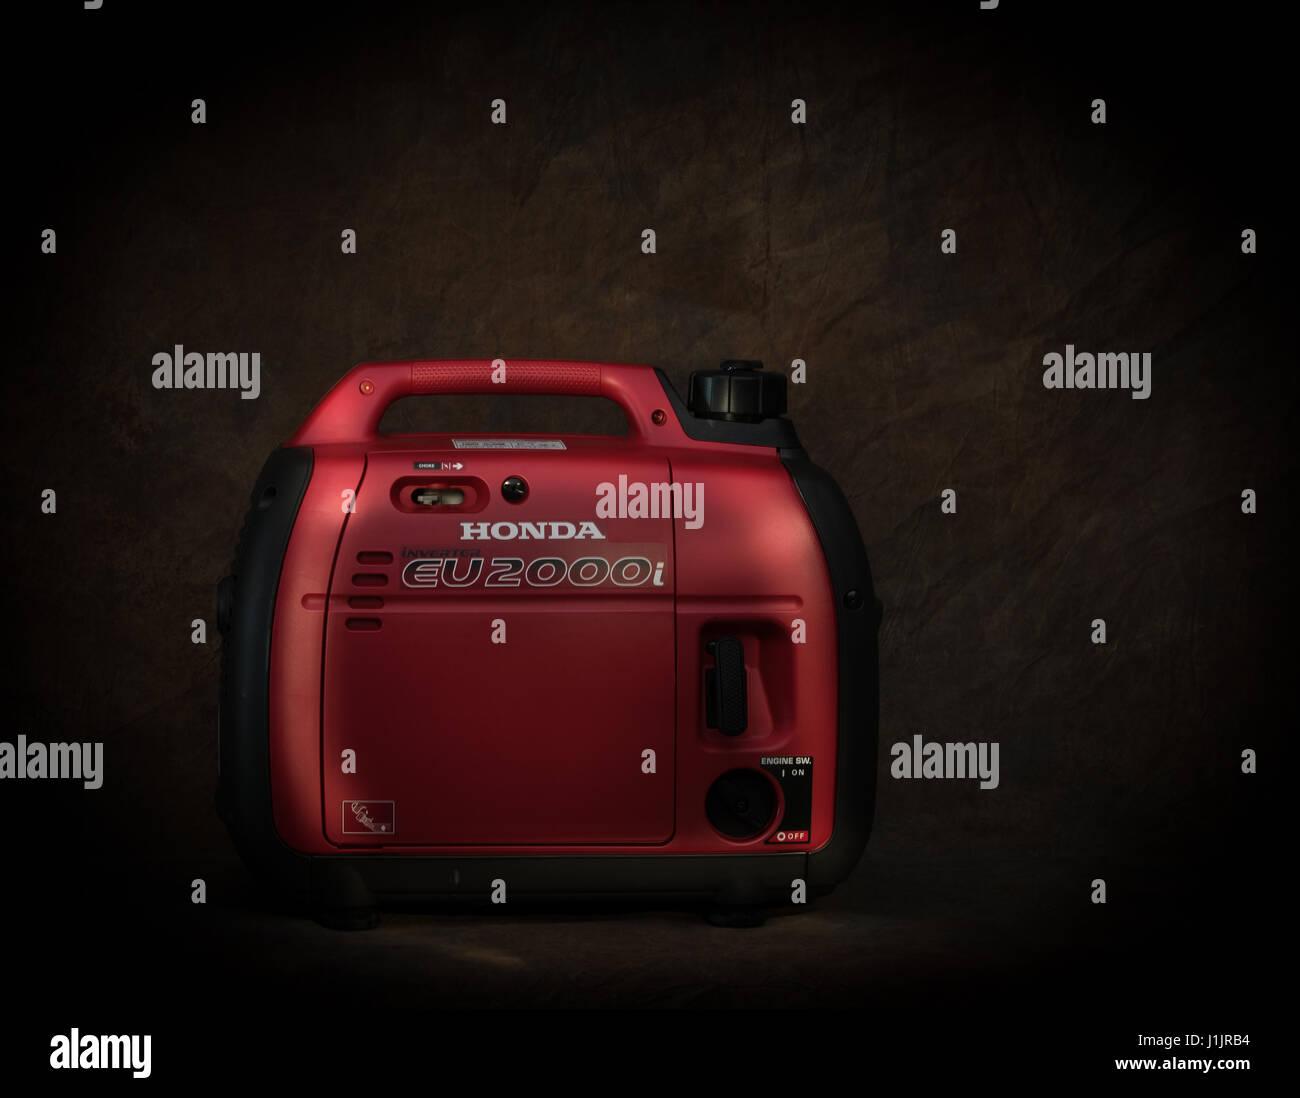 Honda generator - Stock Image